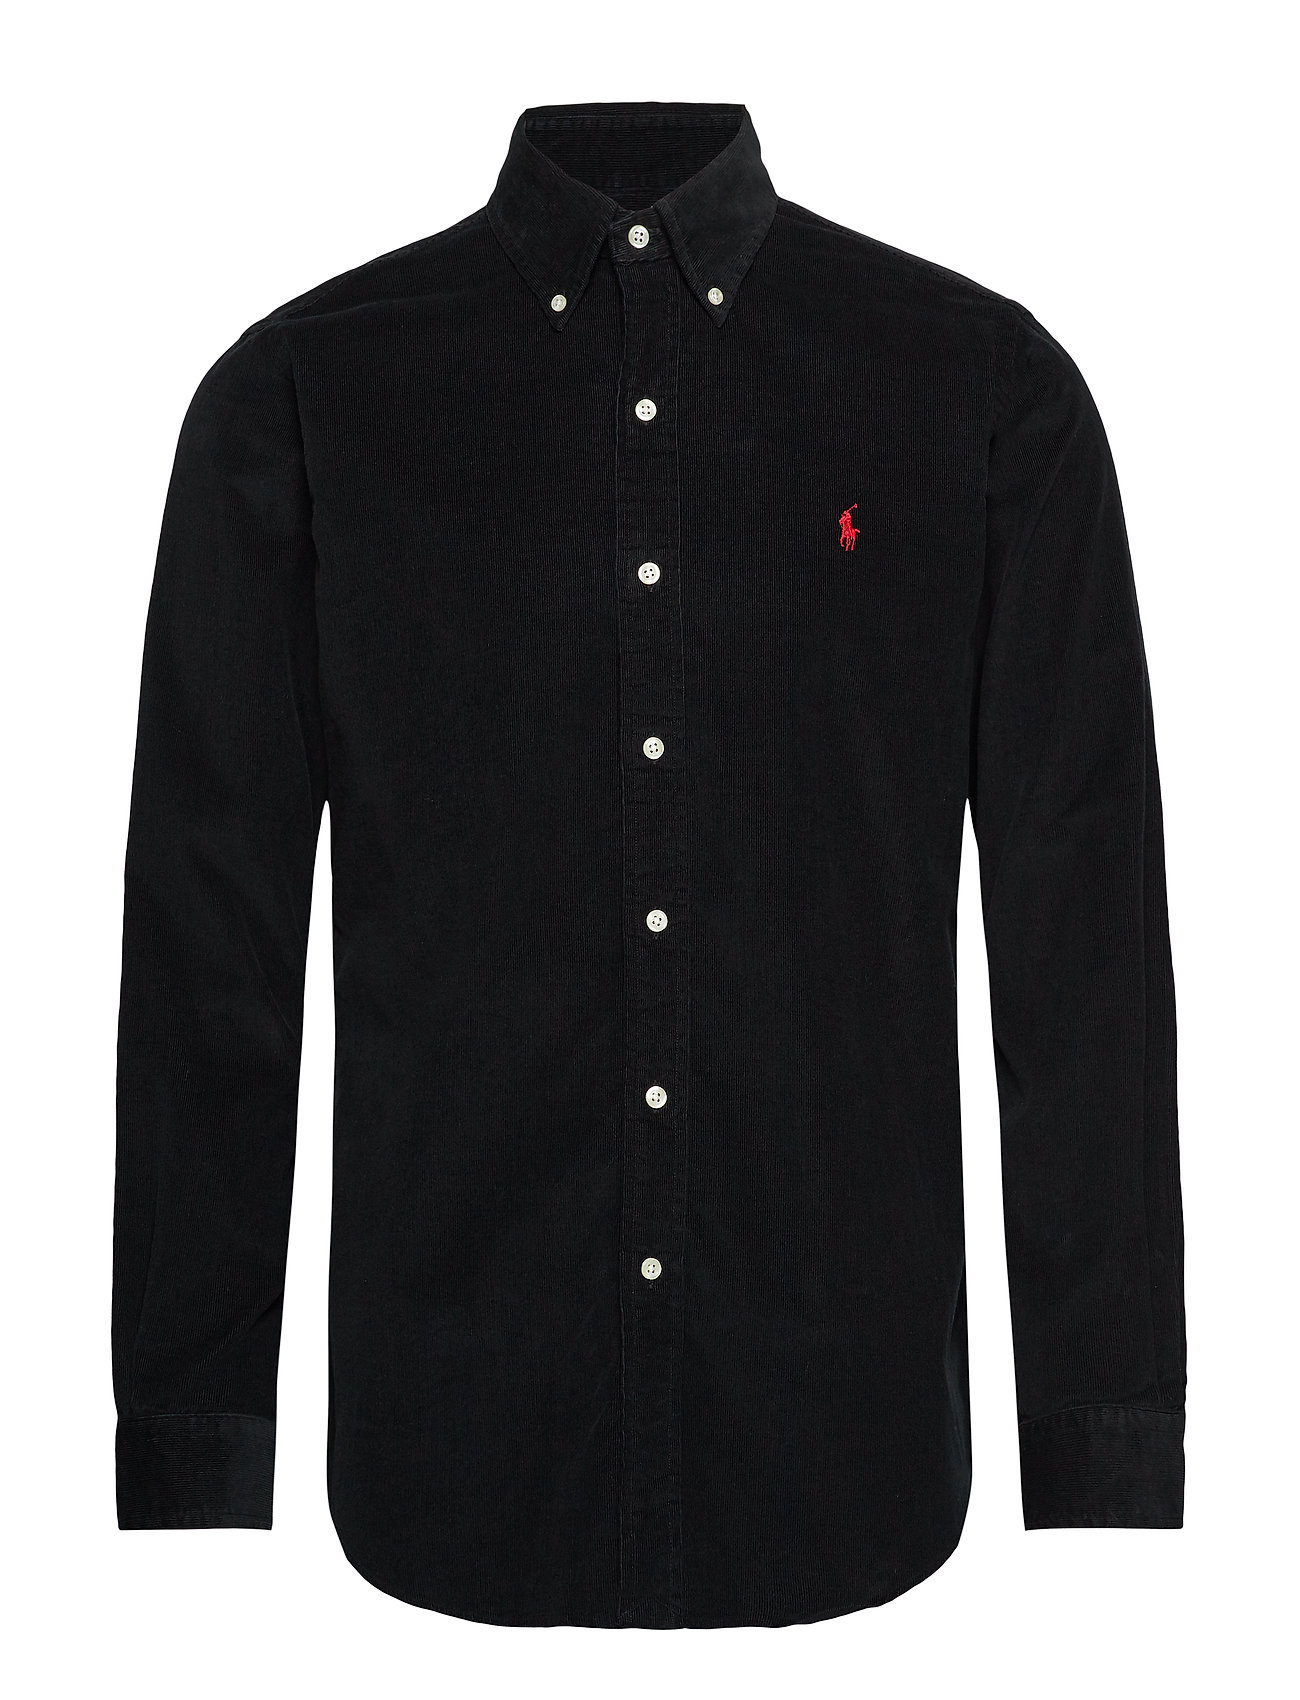 Polo Ralph Lauren CU BD PPC SP-LONG SLEEVE-SPORT SHIRT - POLO BLACK